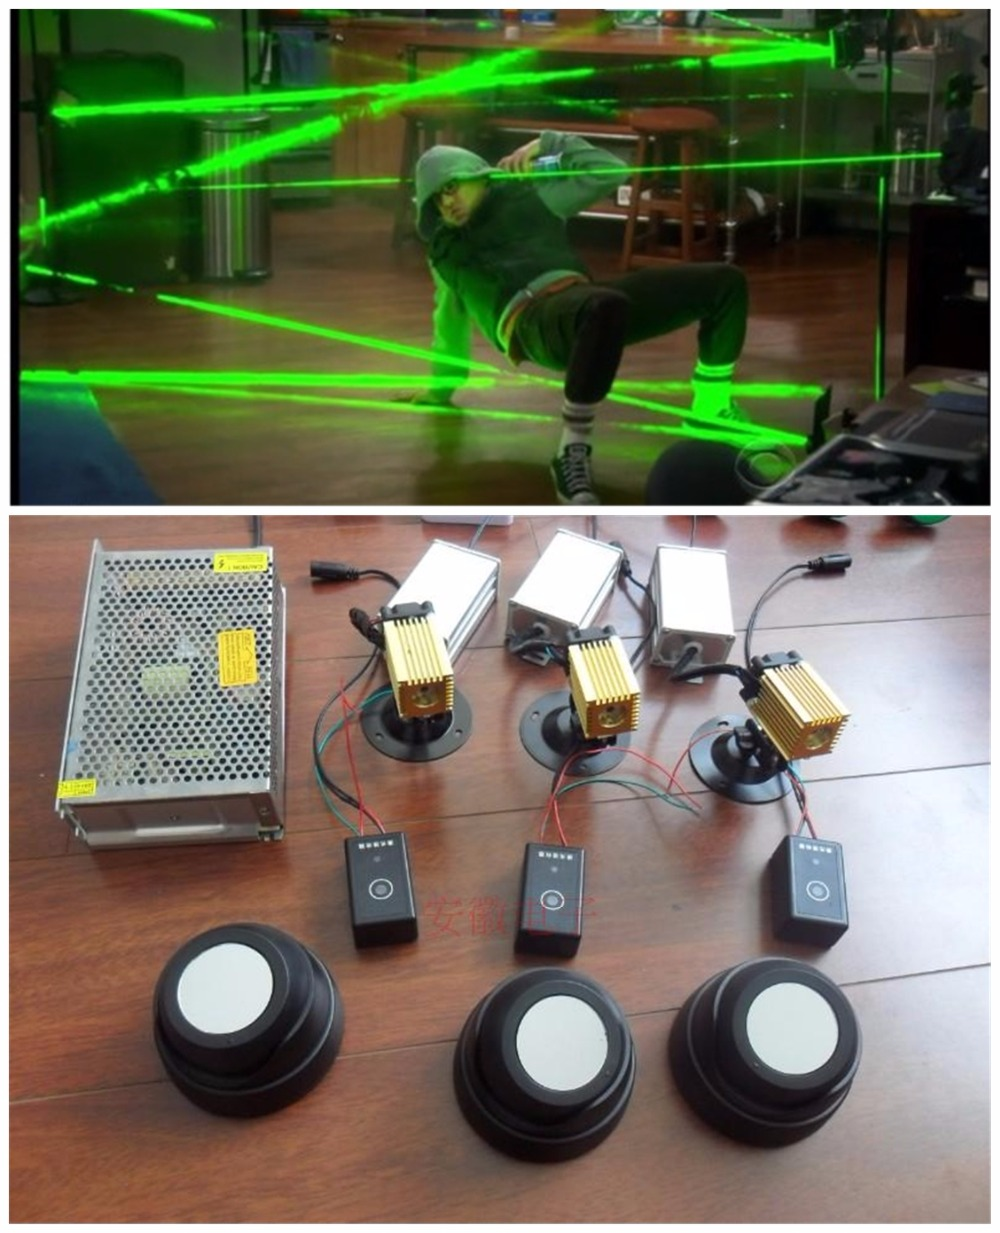 Kit de juego secreto Cámara de escape cámara de escape láser verde sala de la vida Real